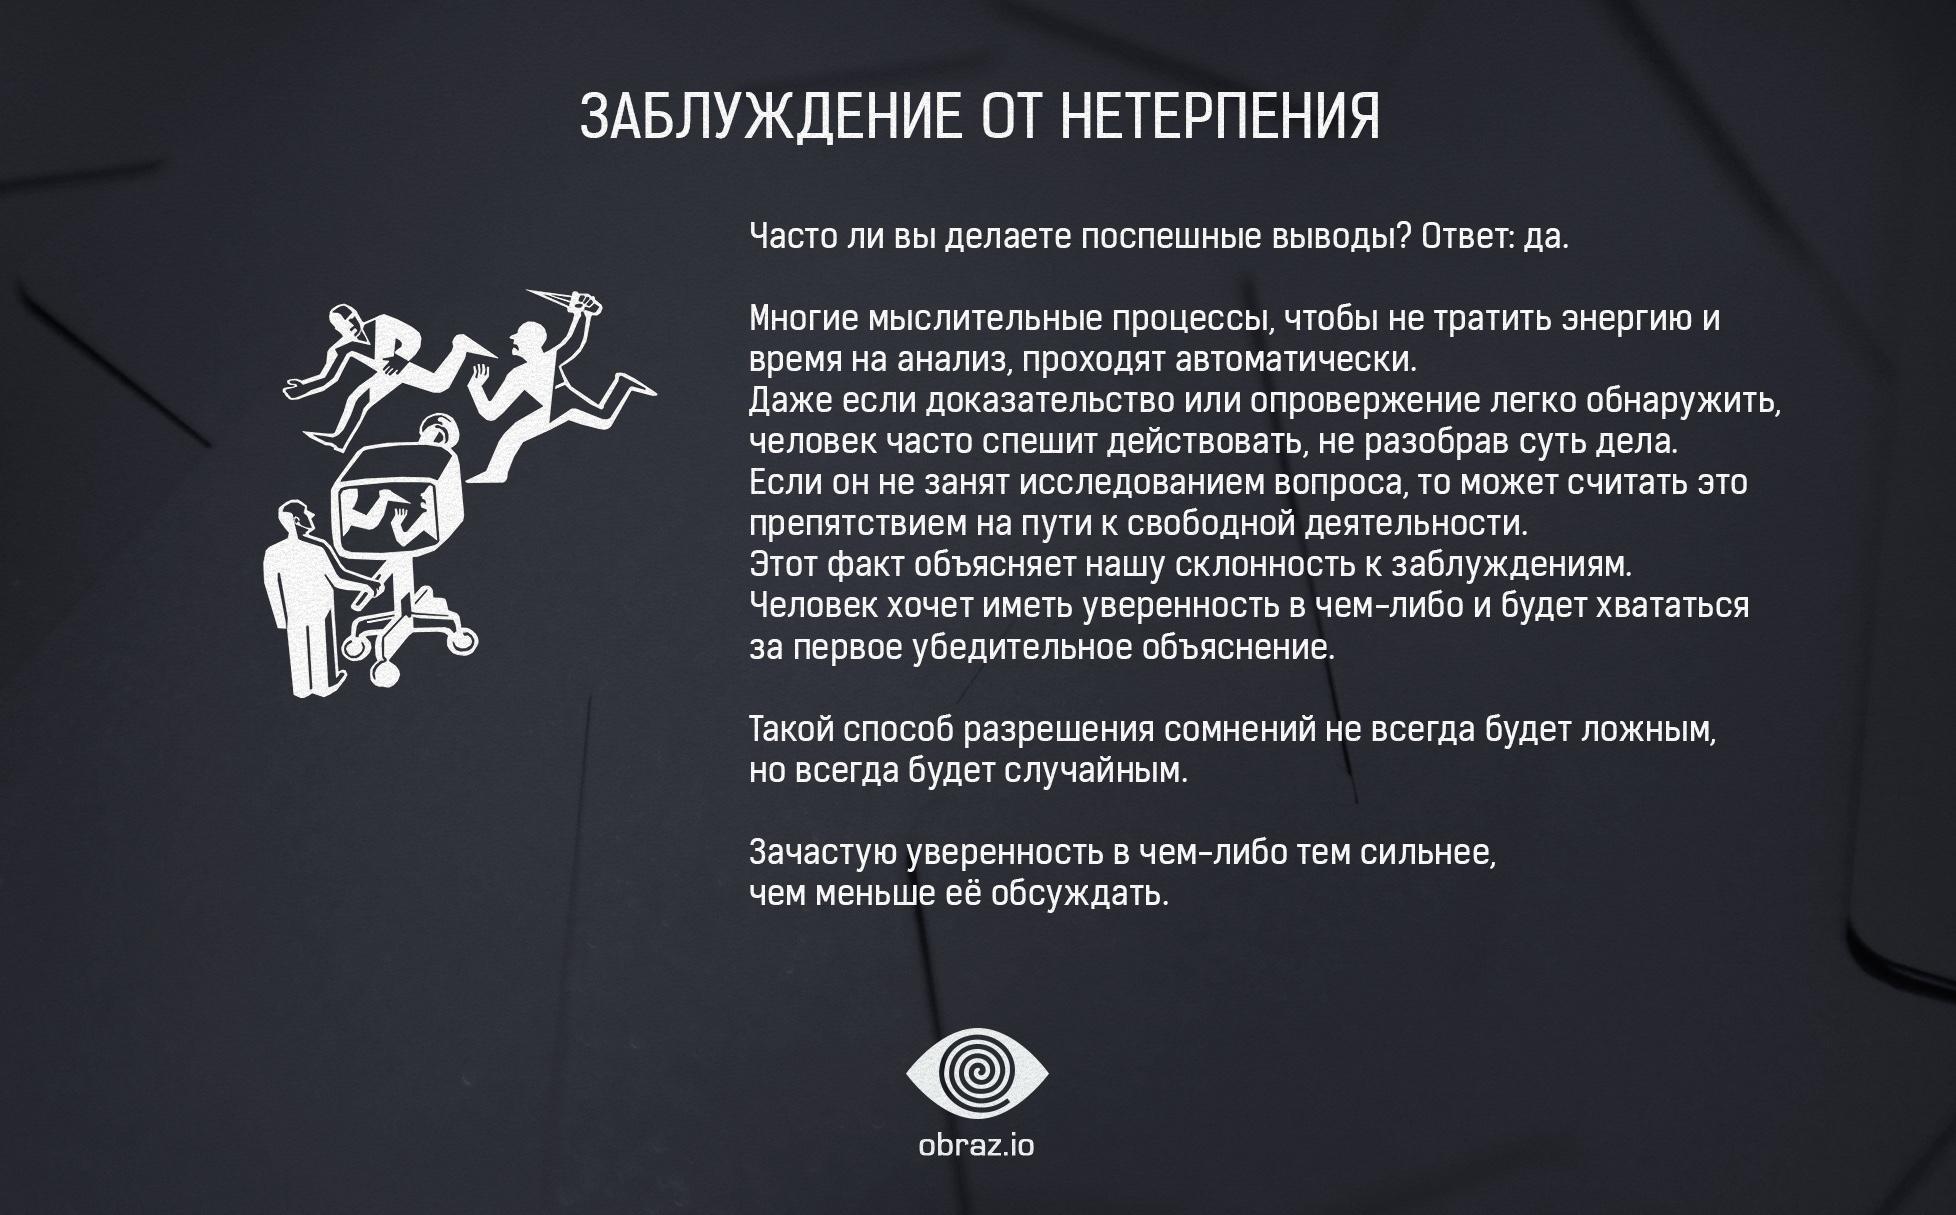 Email:learningkurakov@gmail com3292 me5ar9.u9al1ve7b9